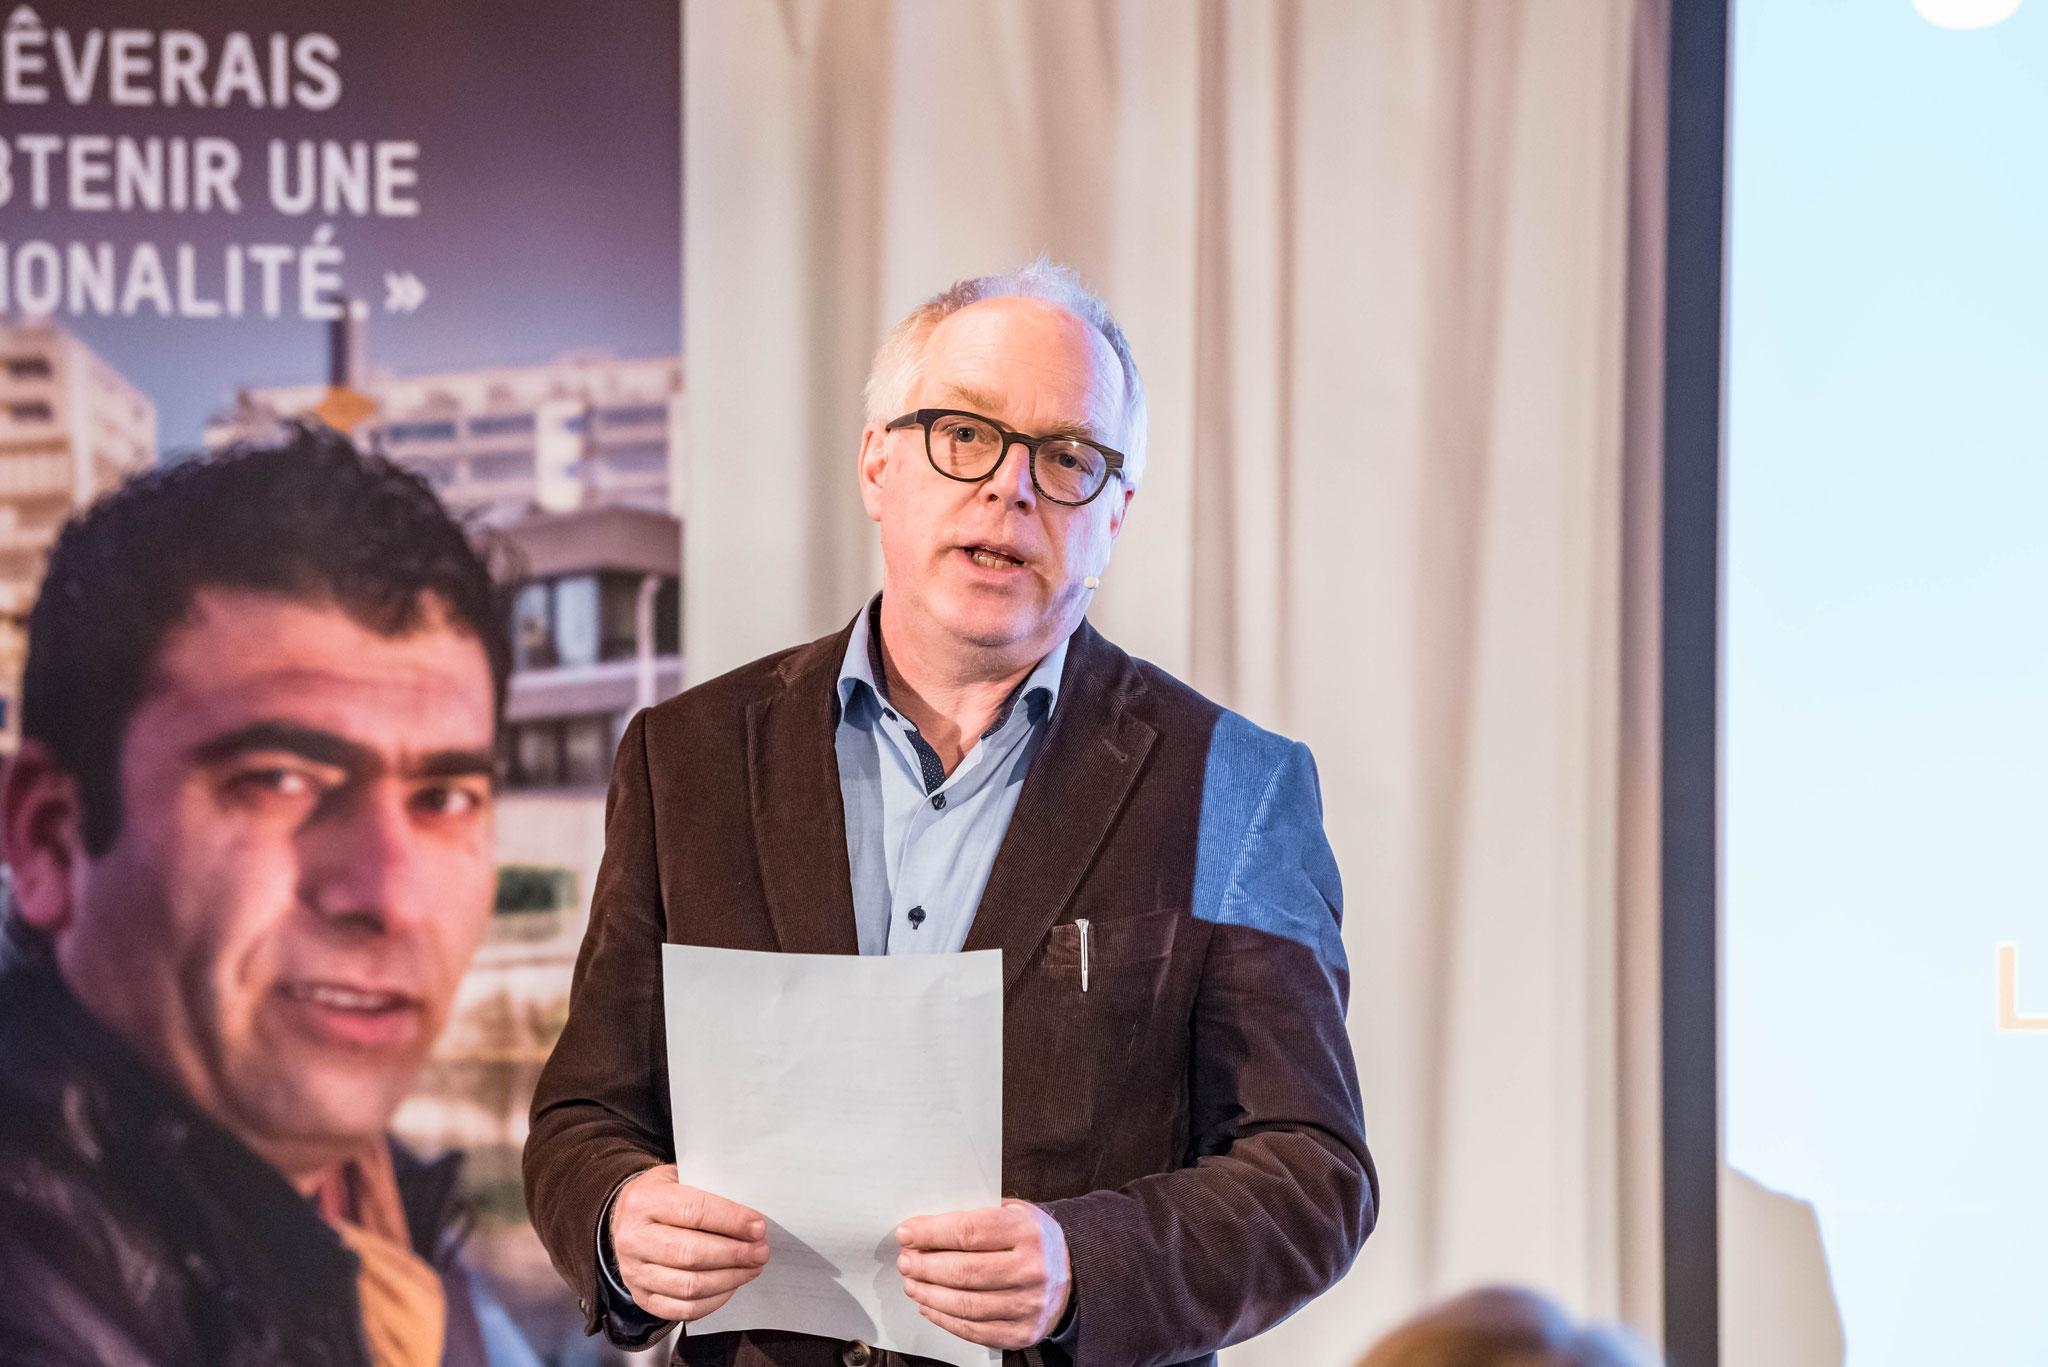 Thomas Göttin (Leiter Polit-Forum Bern)